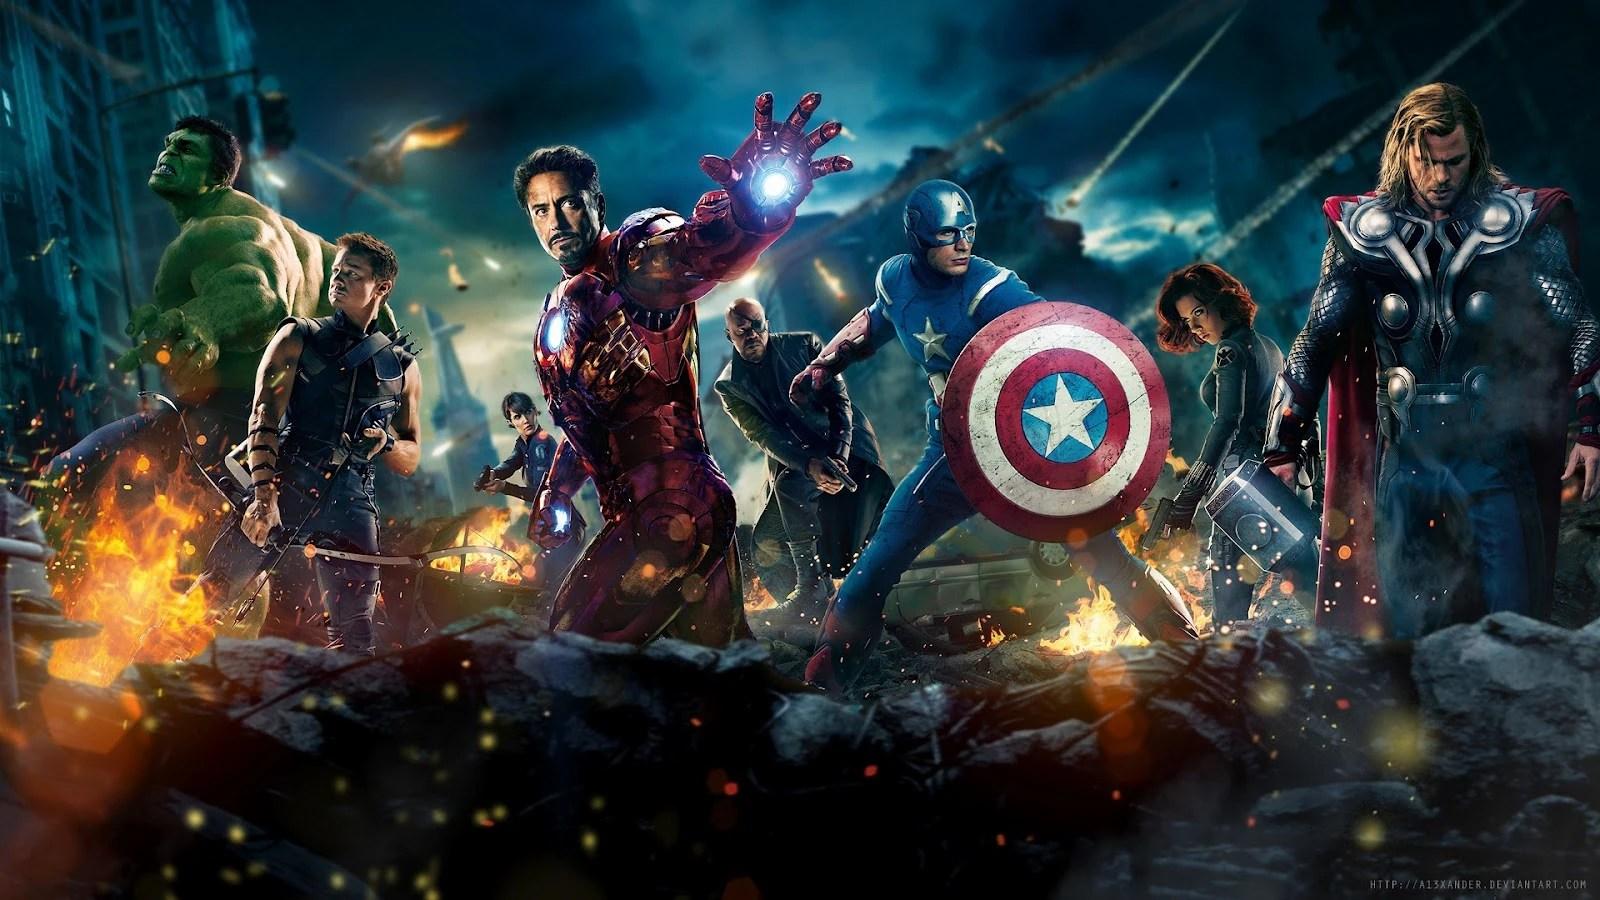 Image - Avengers-2012-full-hd-wallpaper-1920x1080-movie-1080p.jpg | Disney Wiki | FANDOM powered ...